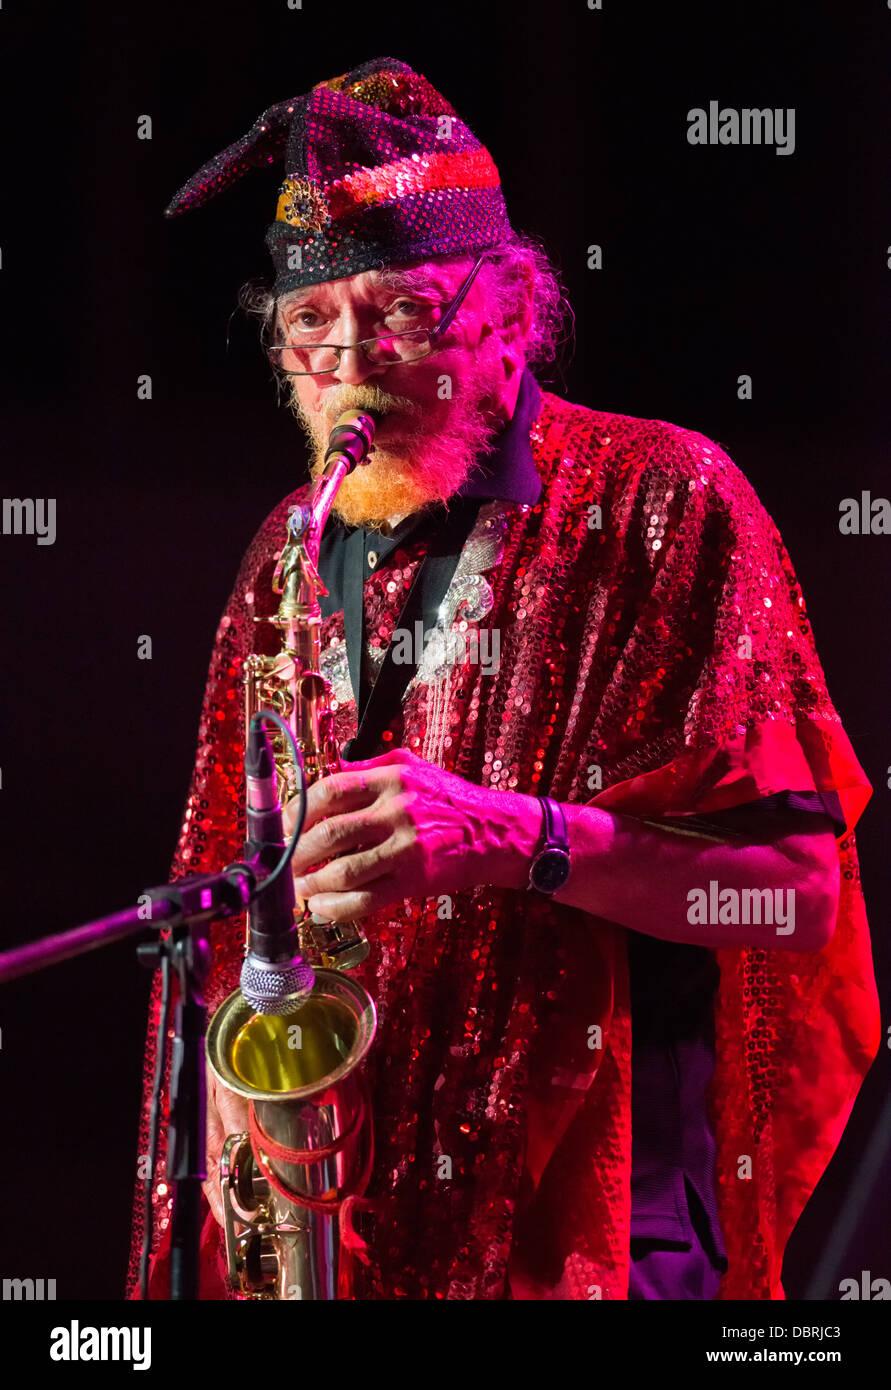 Sun Ra Arkestra during Warsaw Summer Jazz Days 2013 - Stock Image